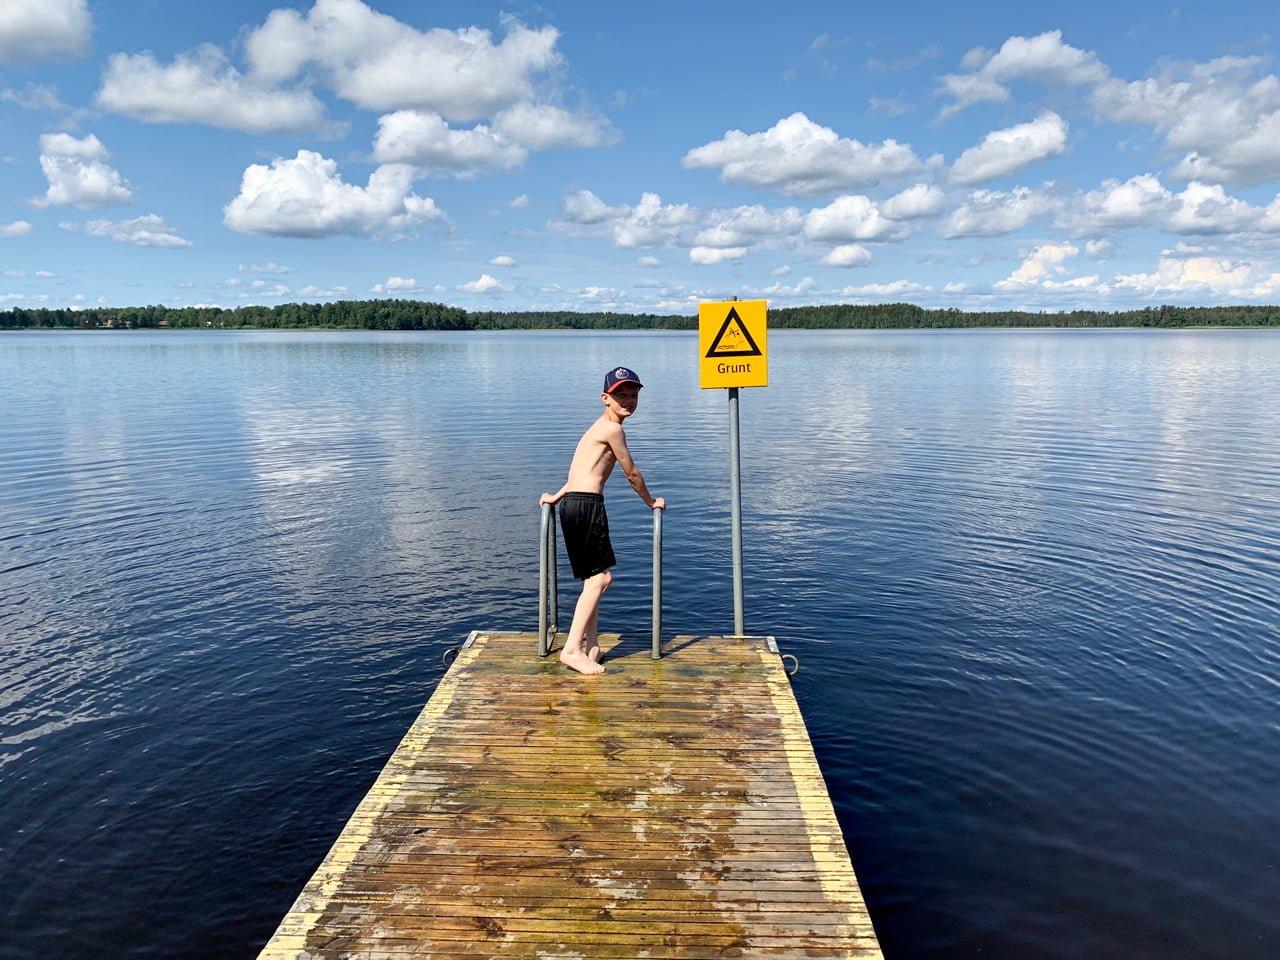 hofsnäs badplats sid